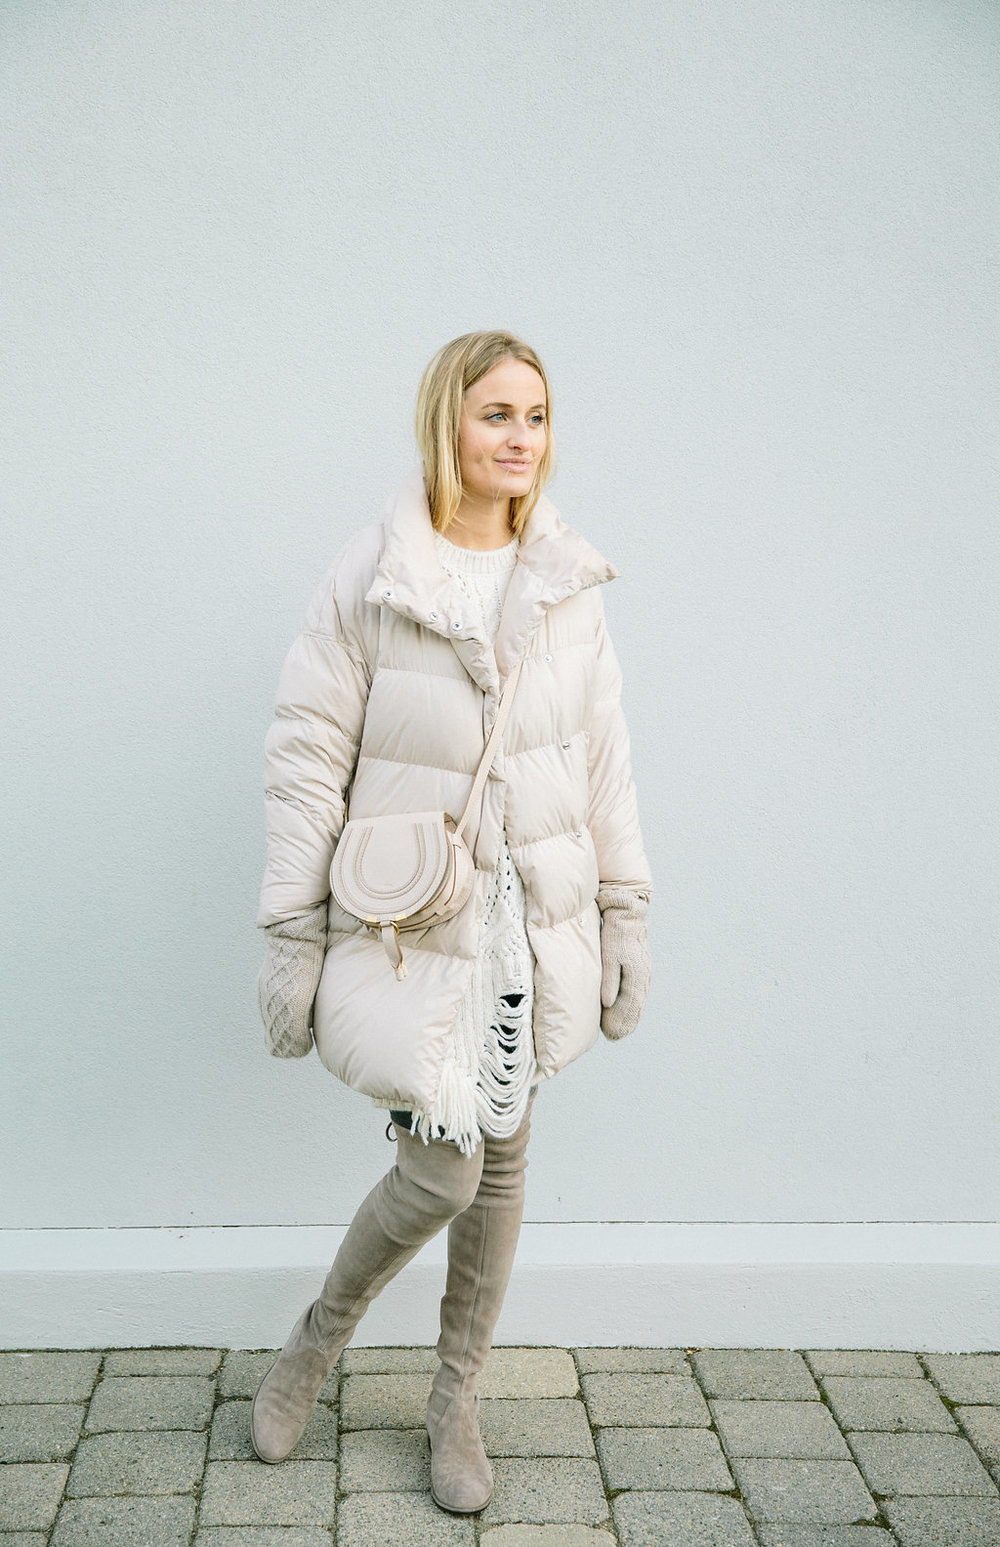 TheGirlGuide-StephanieTrotta-LindsayMaddenPhotography-12.jpg